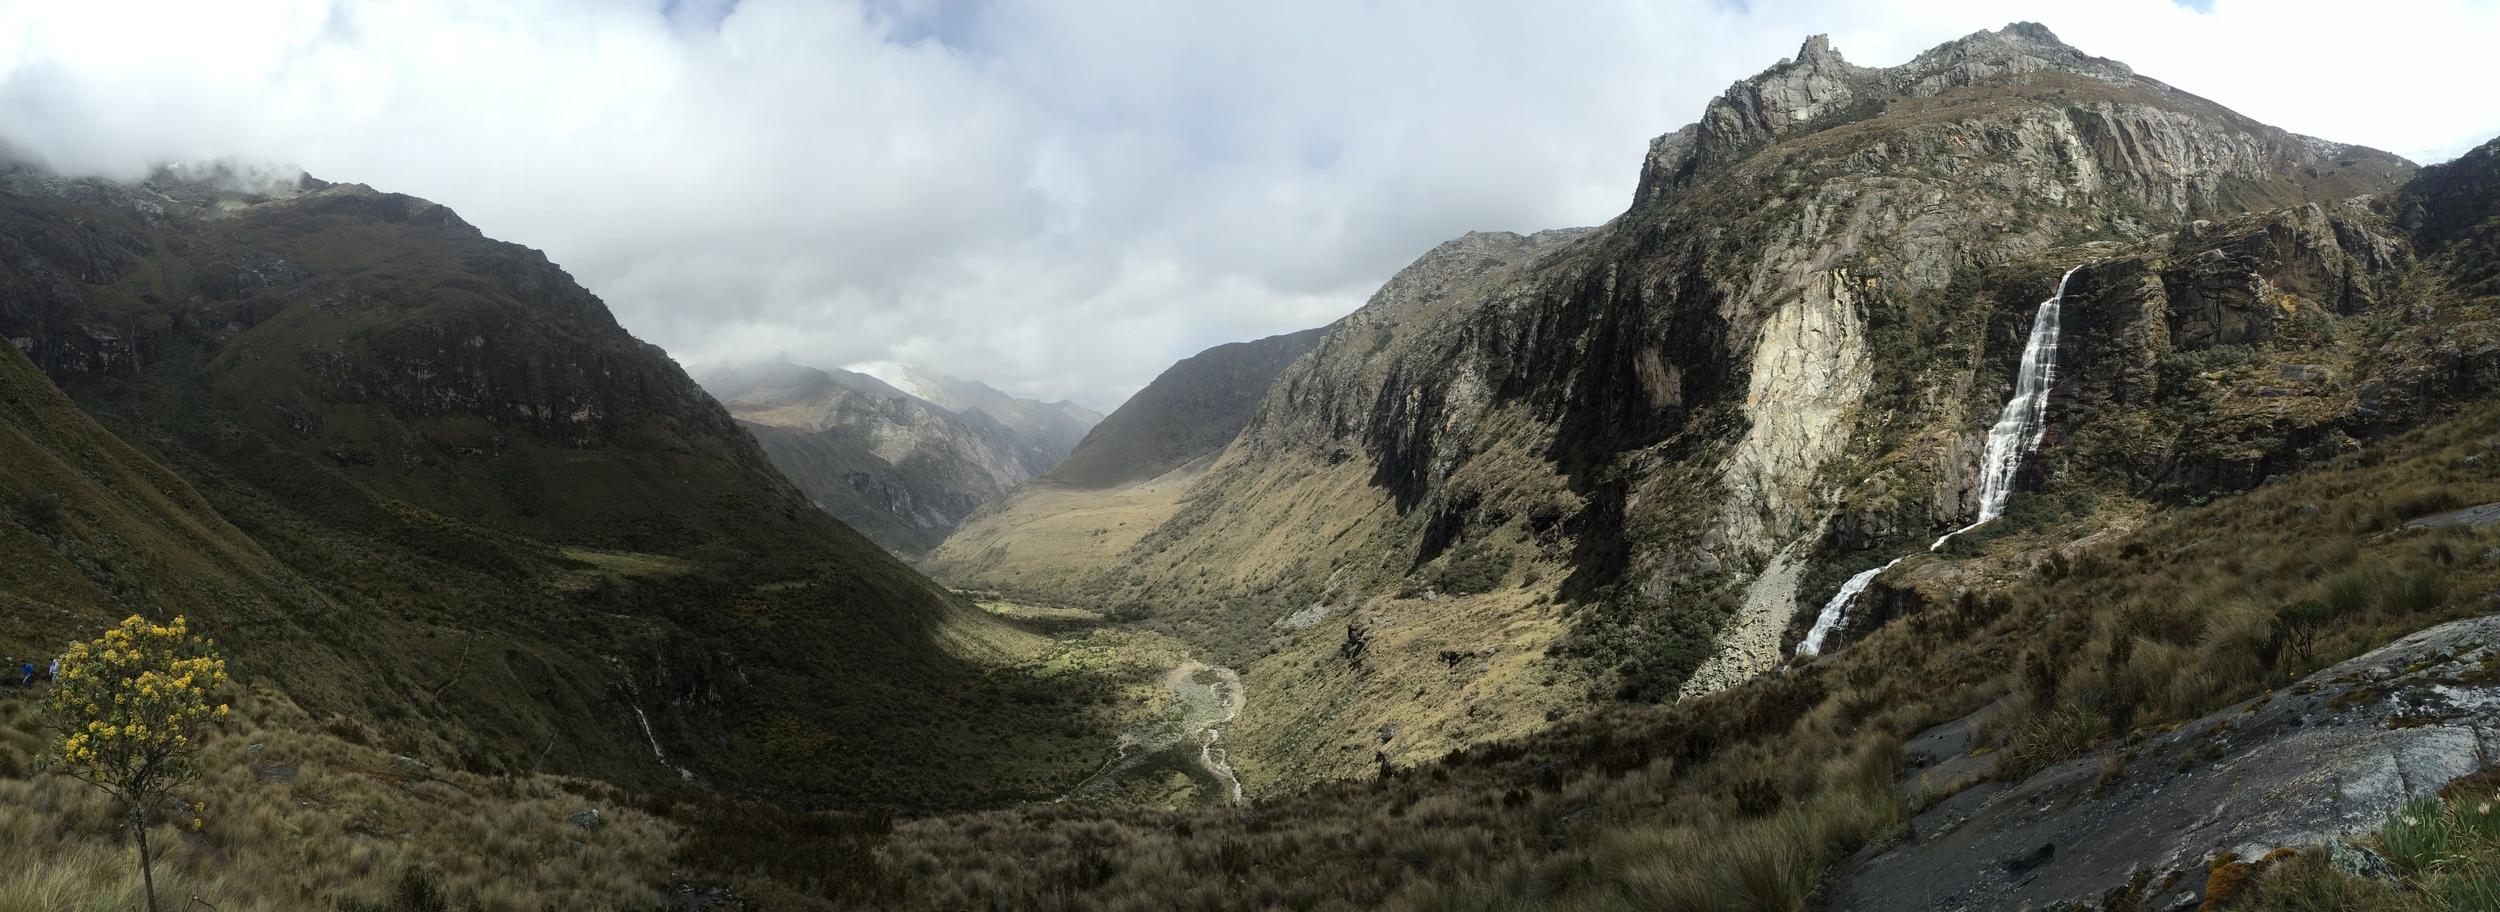 Hiking up to Lago 69 in Cordillera Blanca, Huaraz, Peru